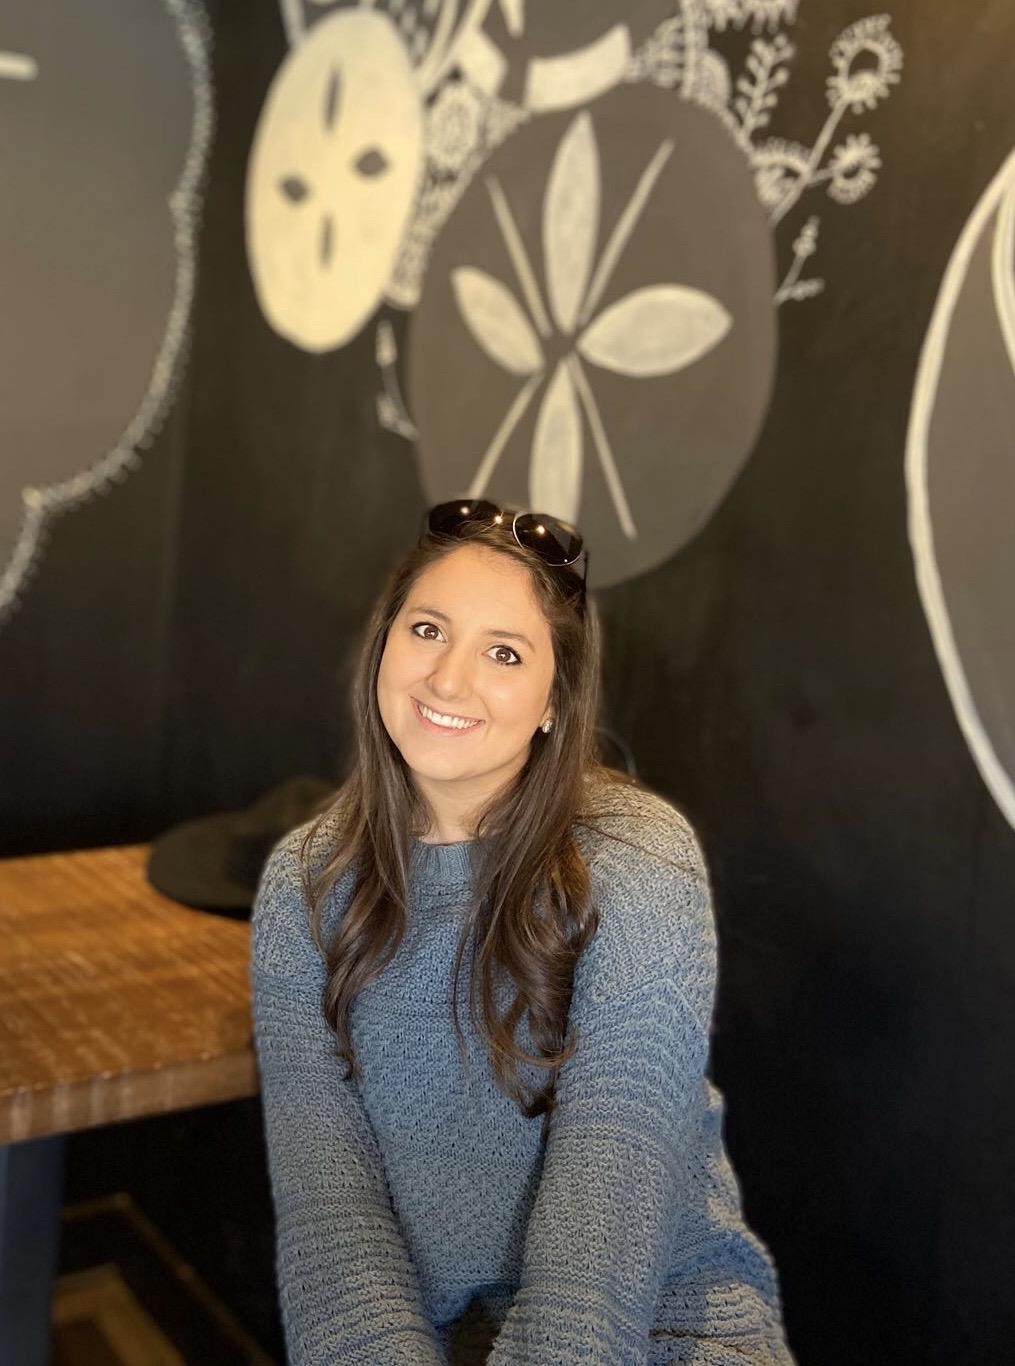 Student Spotlight: Meet Elisa Sandonato!